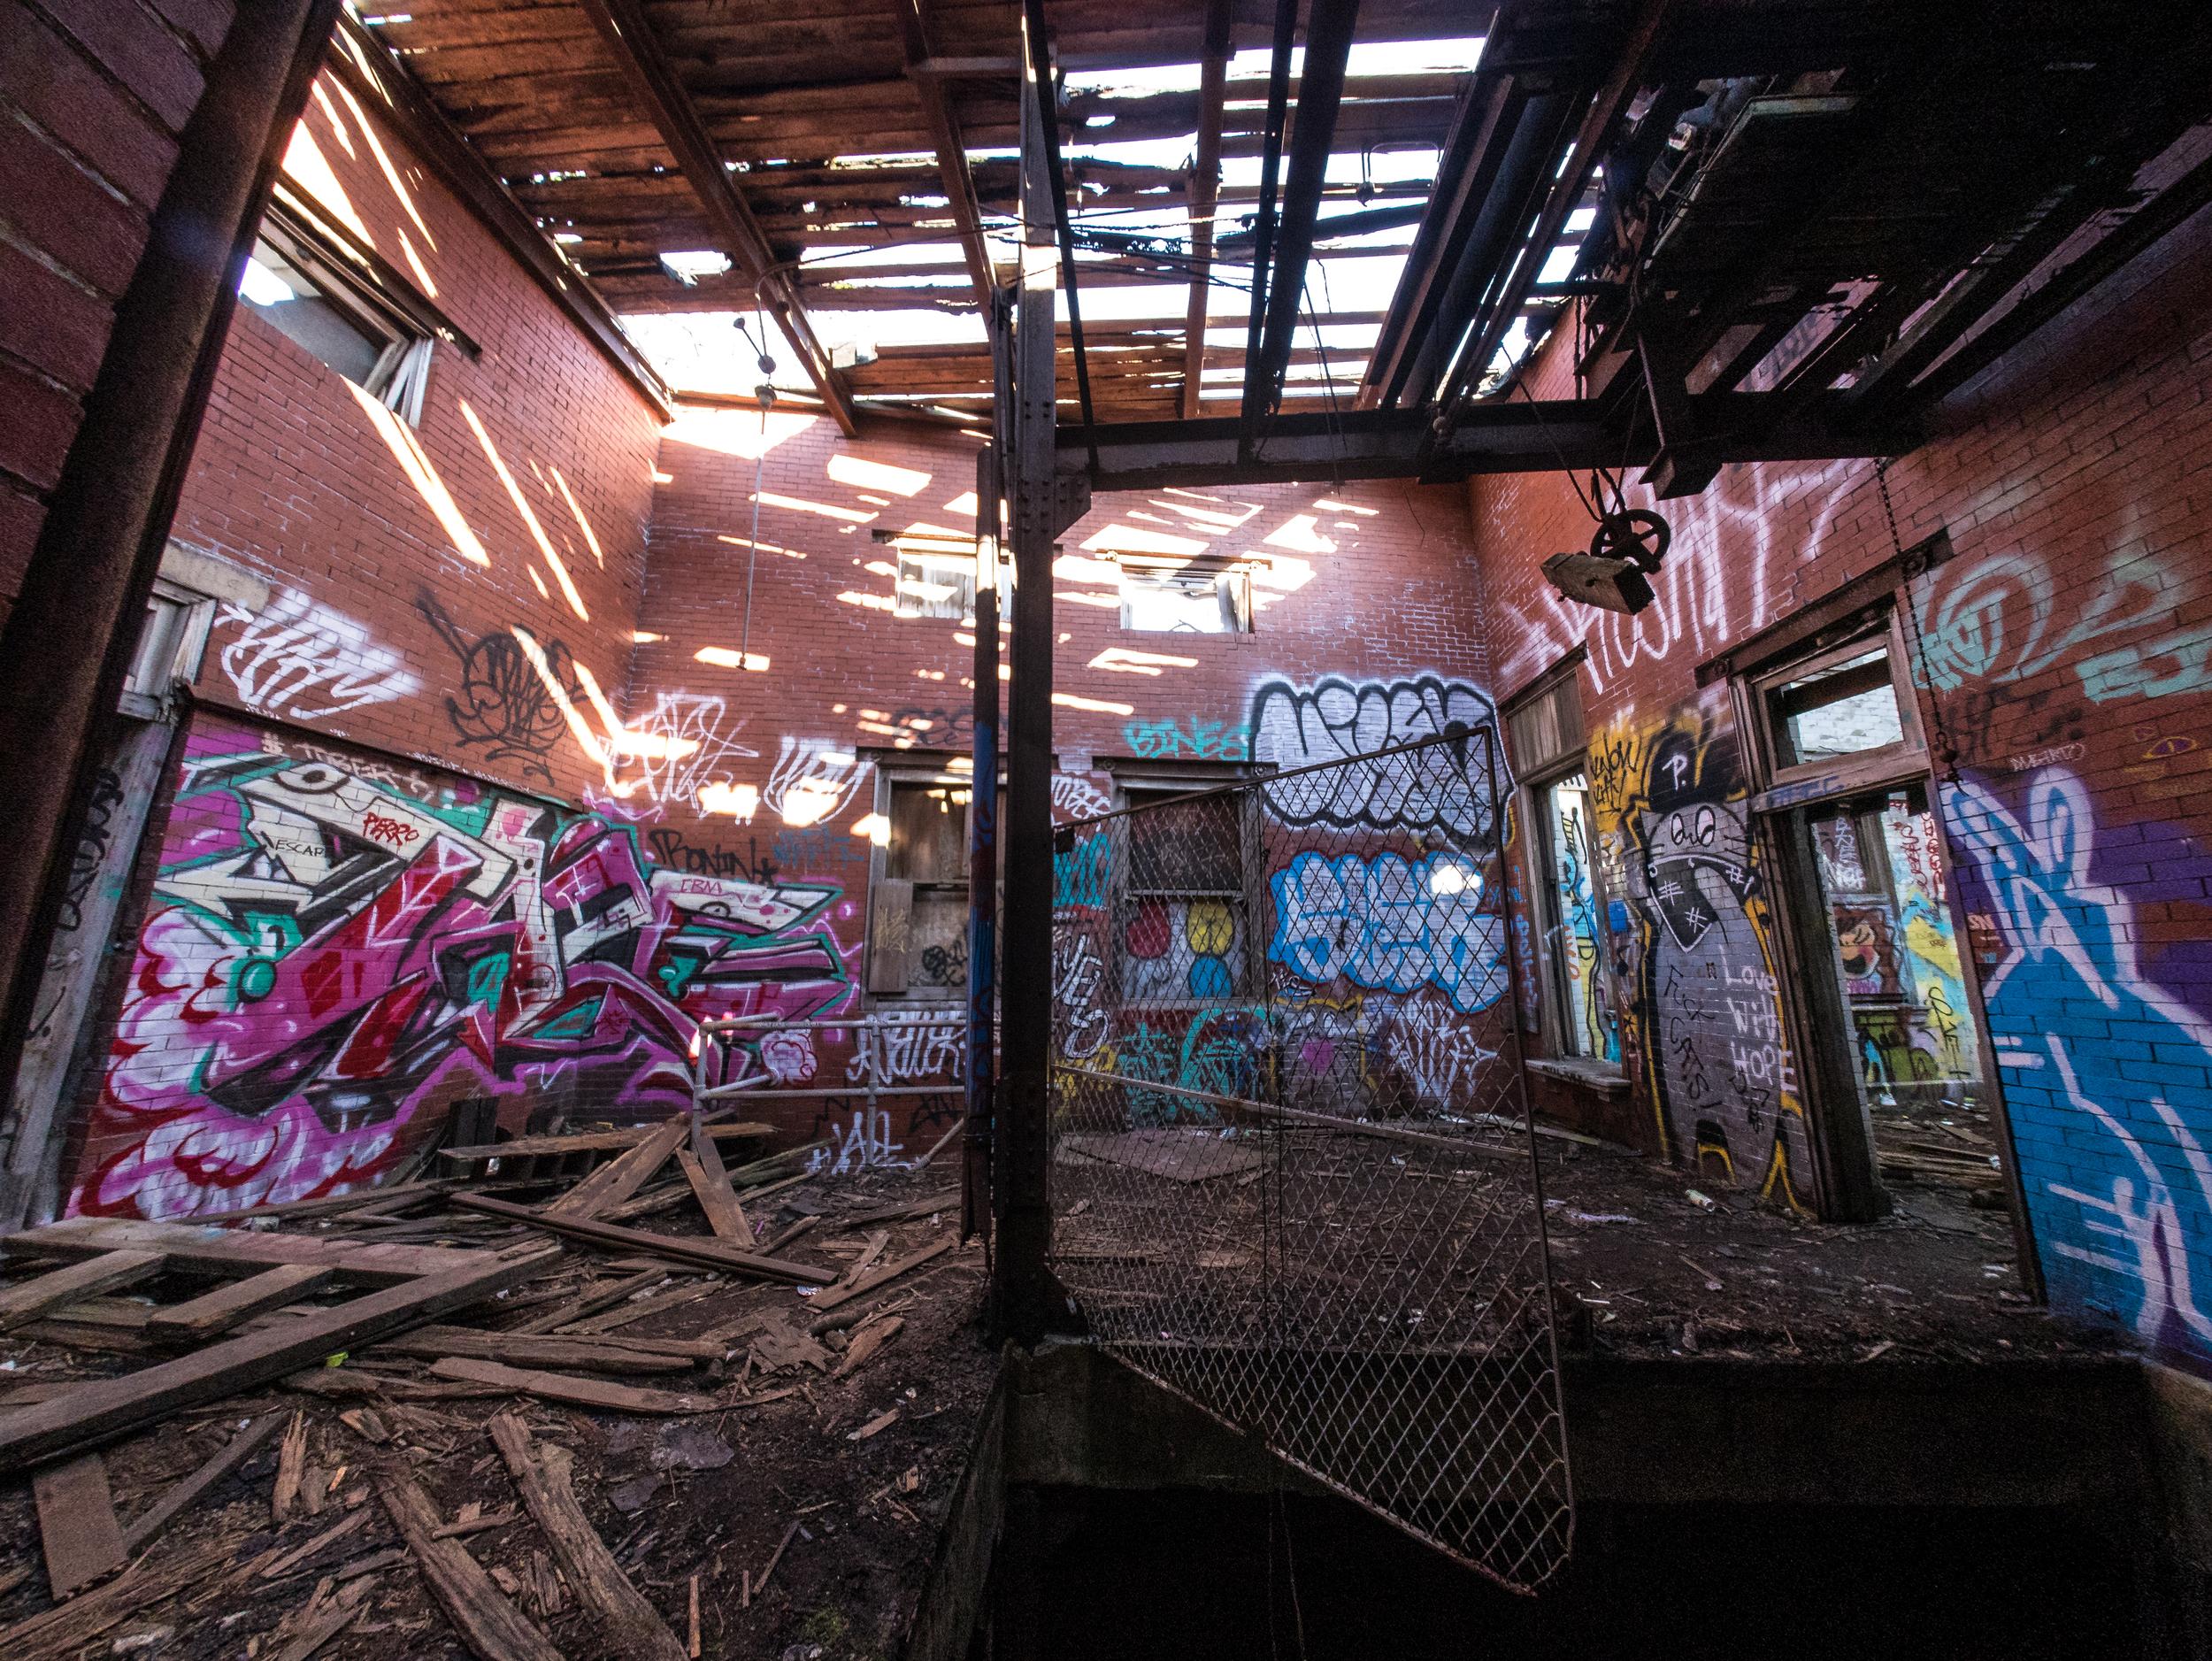 Interior condition